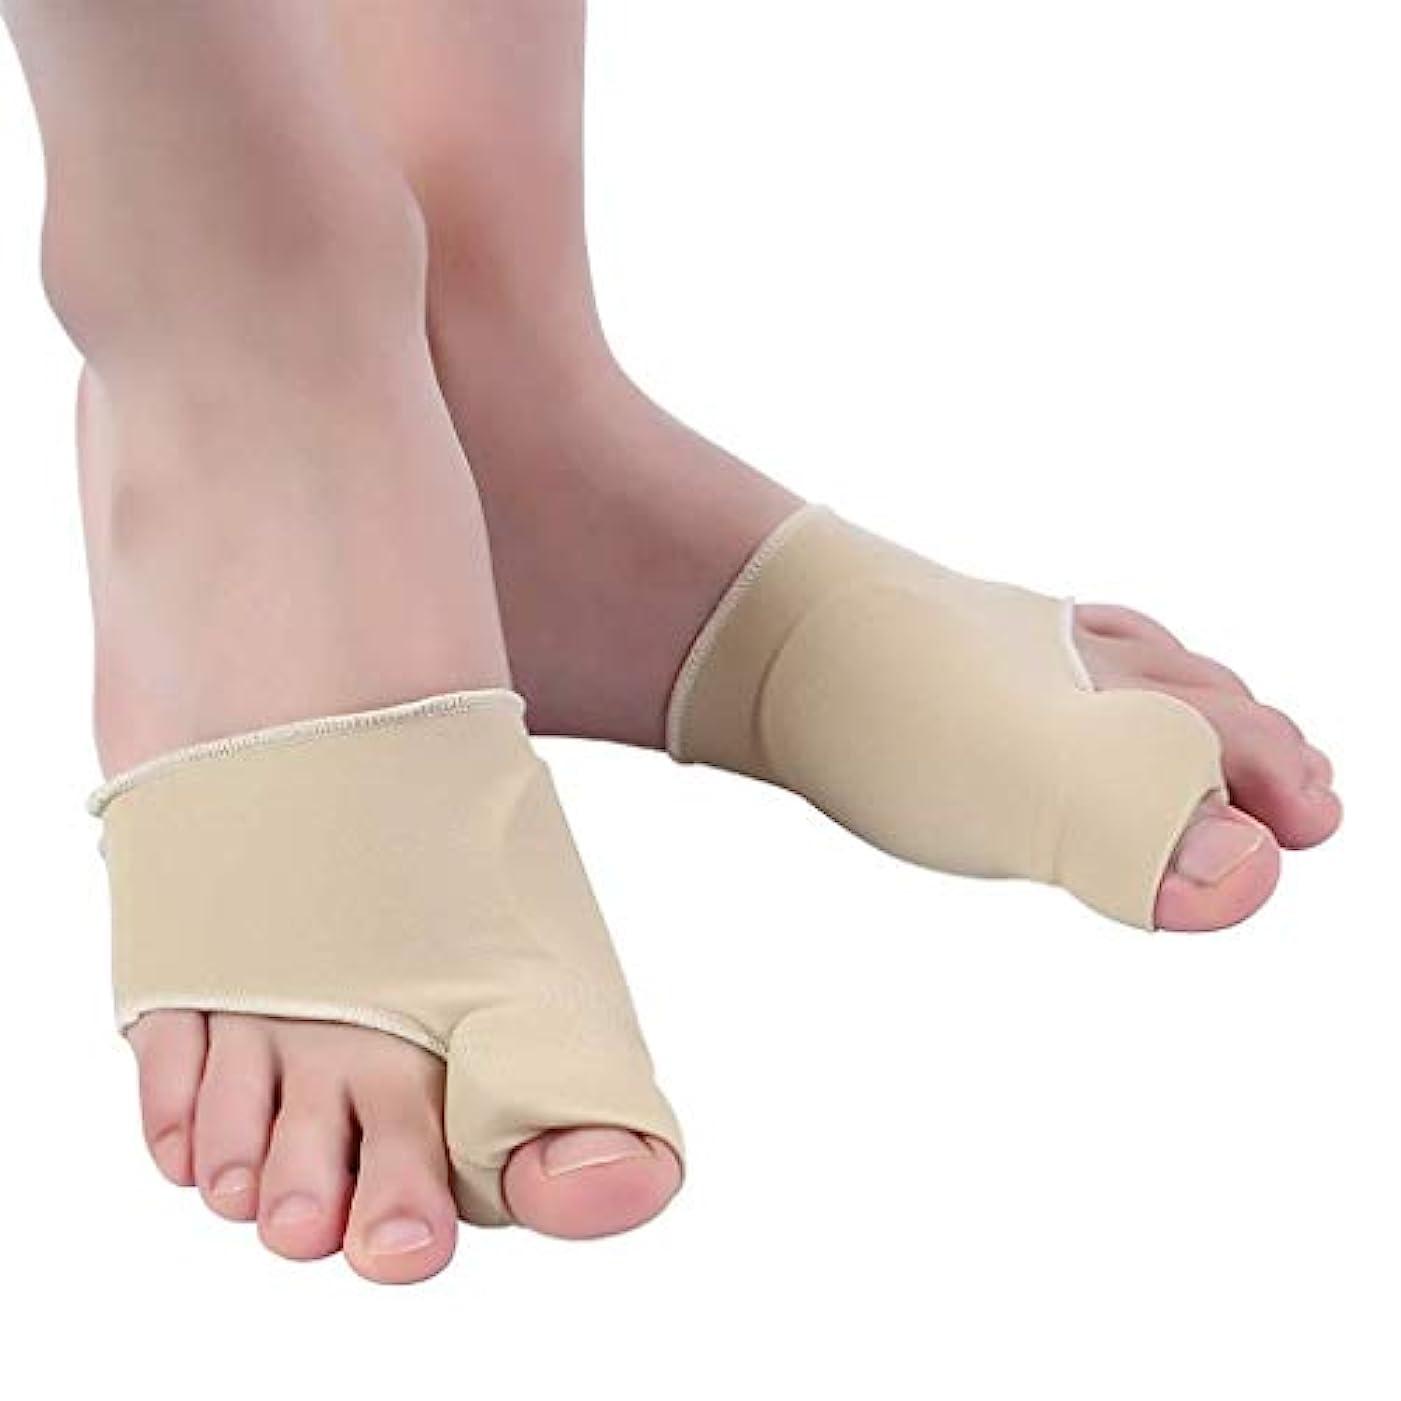 Bunion Corrector Bunion SplintsとBig Toe Straightteners SeparatorナイトタイムHallux外陰部のスプリント、Bunion Relief (Size : Small)